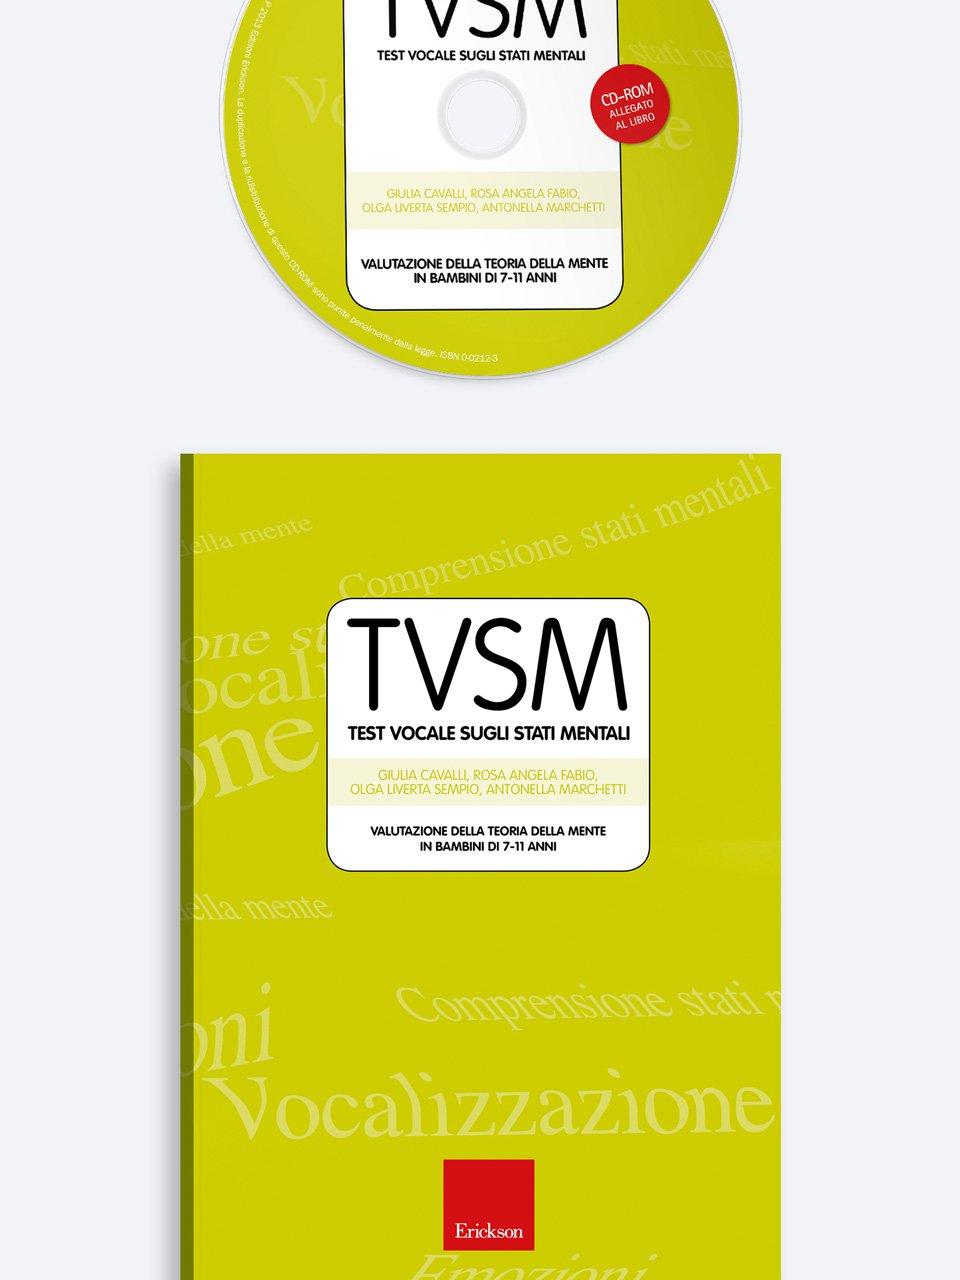 Test TVSM - Test Vocale sugli Stati Mentali - Test TINV - Intelligenza non verbale - Libri - Strumenti - Erickson